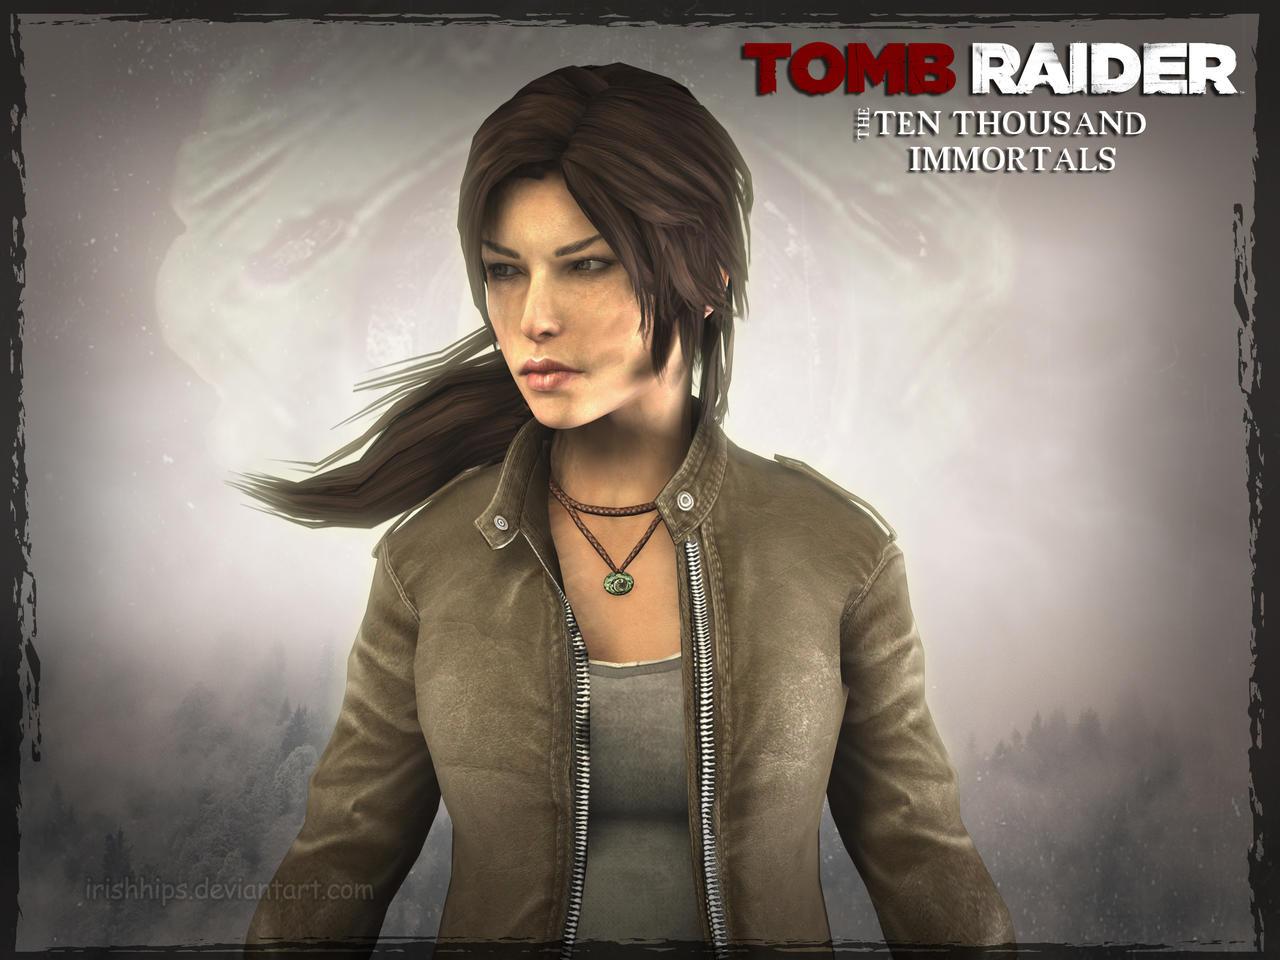 Tomb Raider The Ten Thousand Immortals By Irishhips On DeviantArt